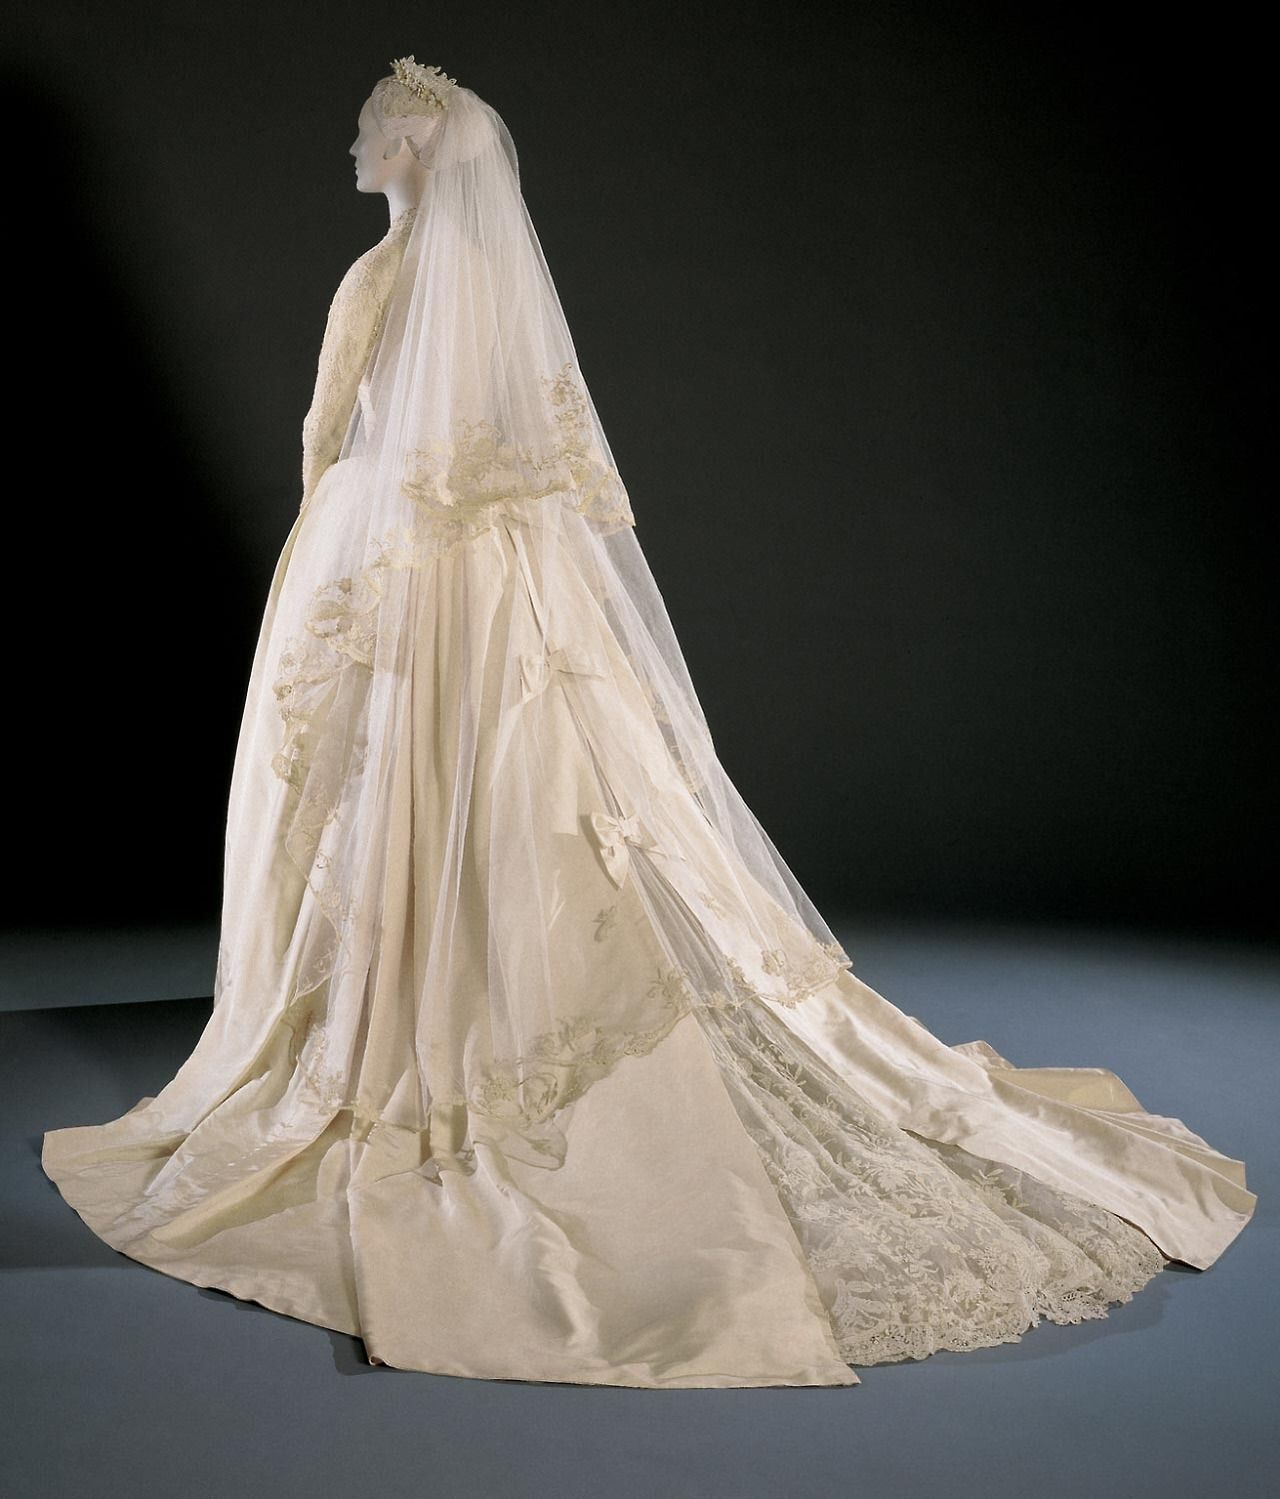 Defunct Fashion Royal Wedding Dress Grace Kelly Wedding Grace Kelly Wedding Dress [ 1499 x 1280 Pixel ]